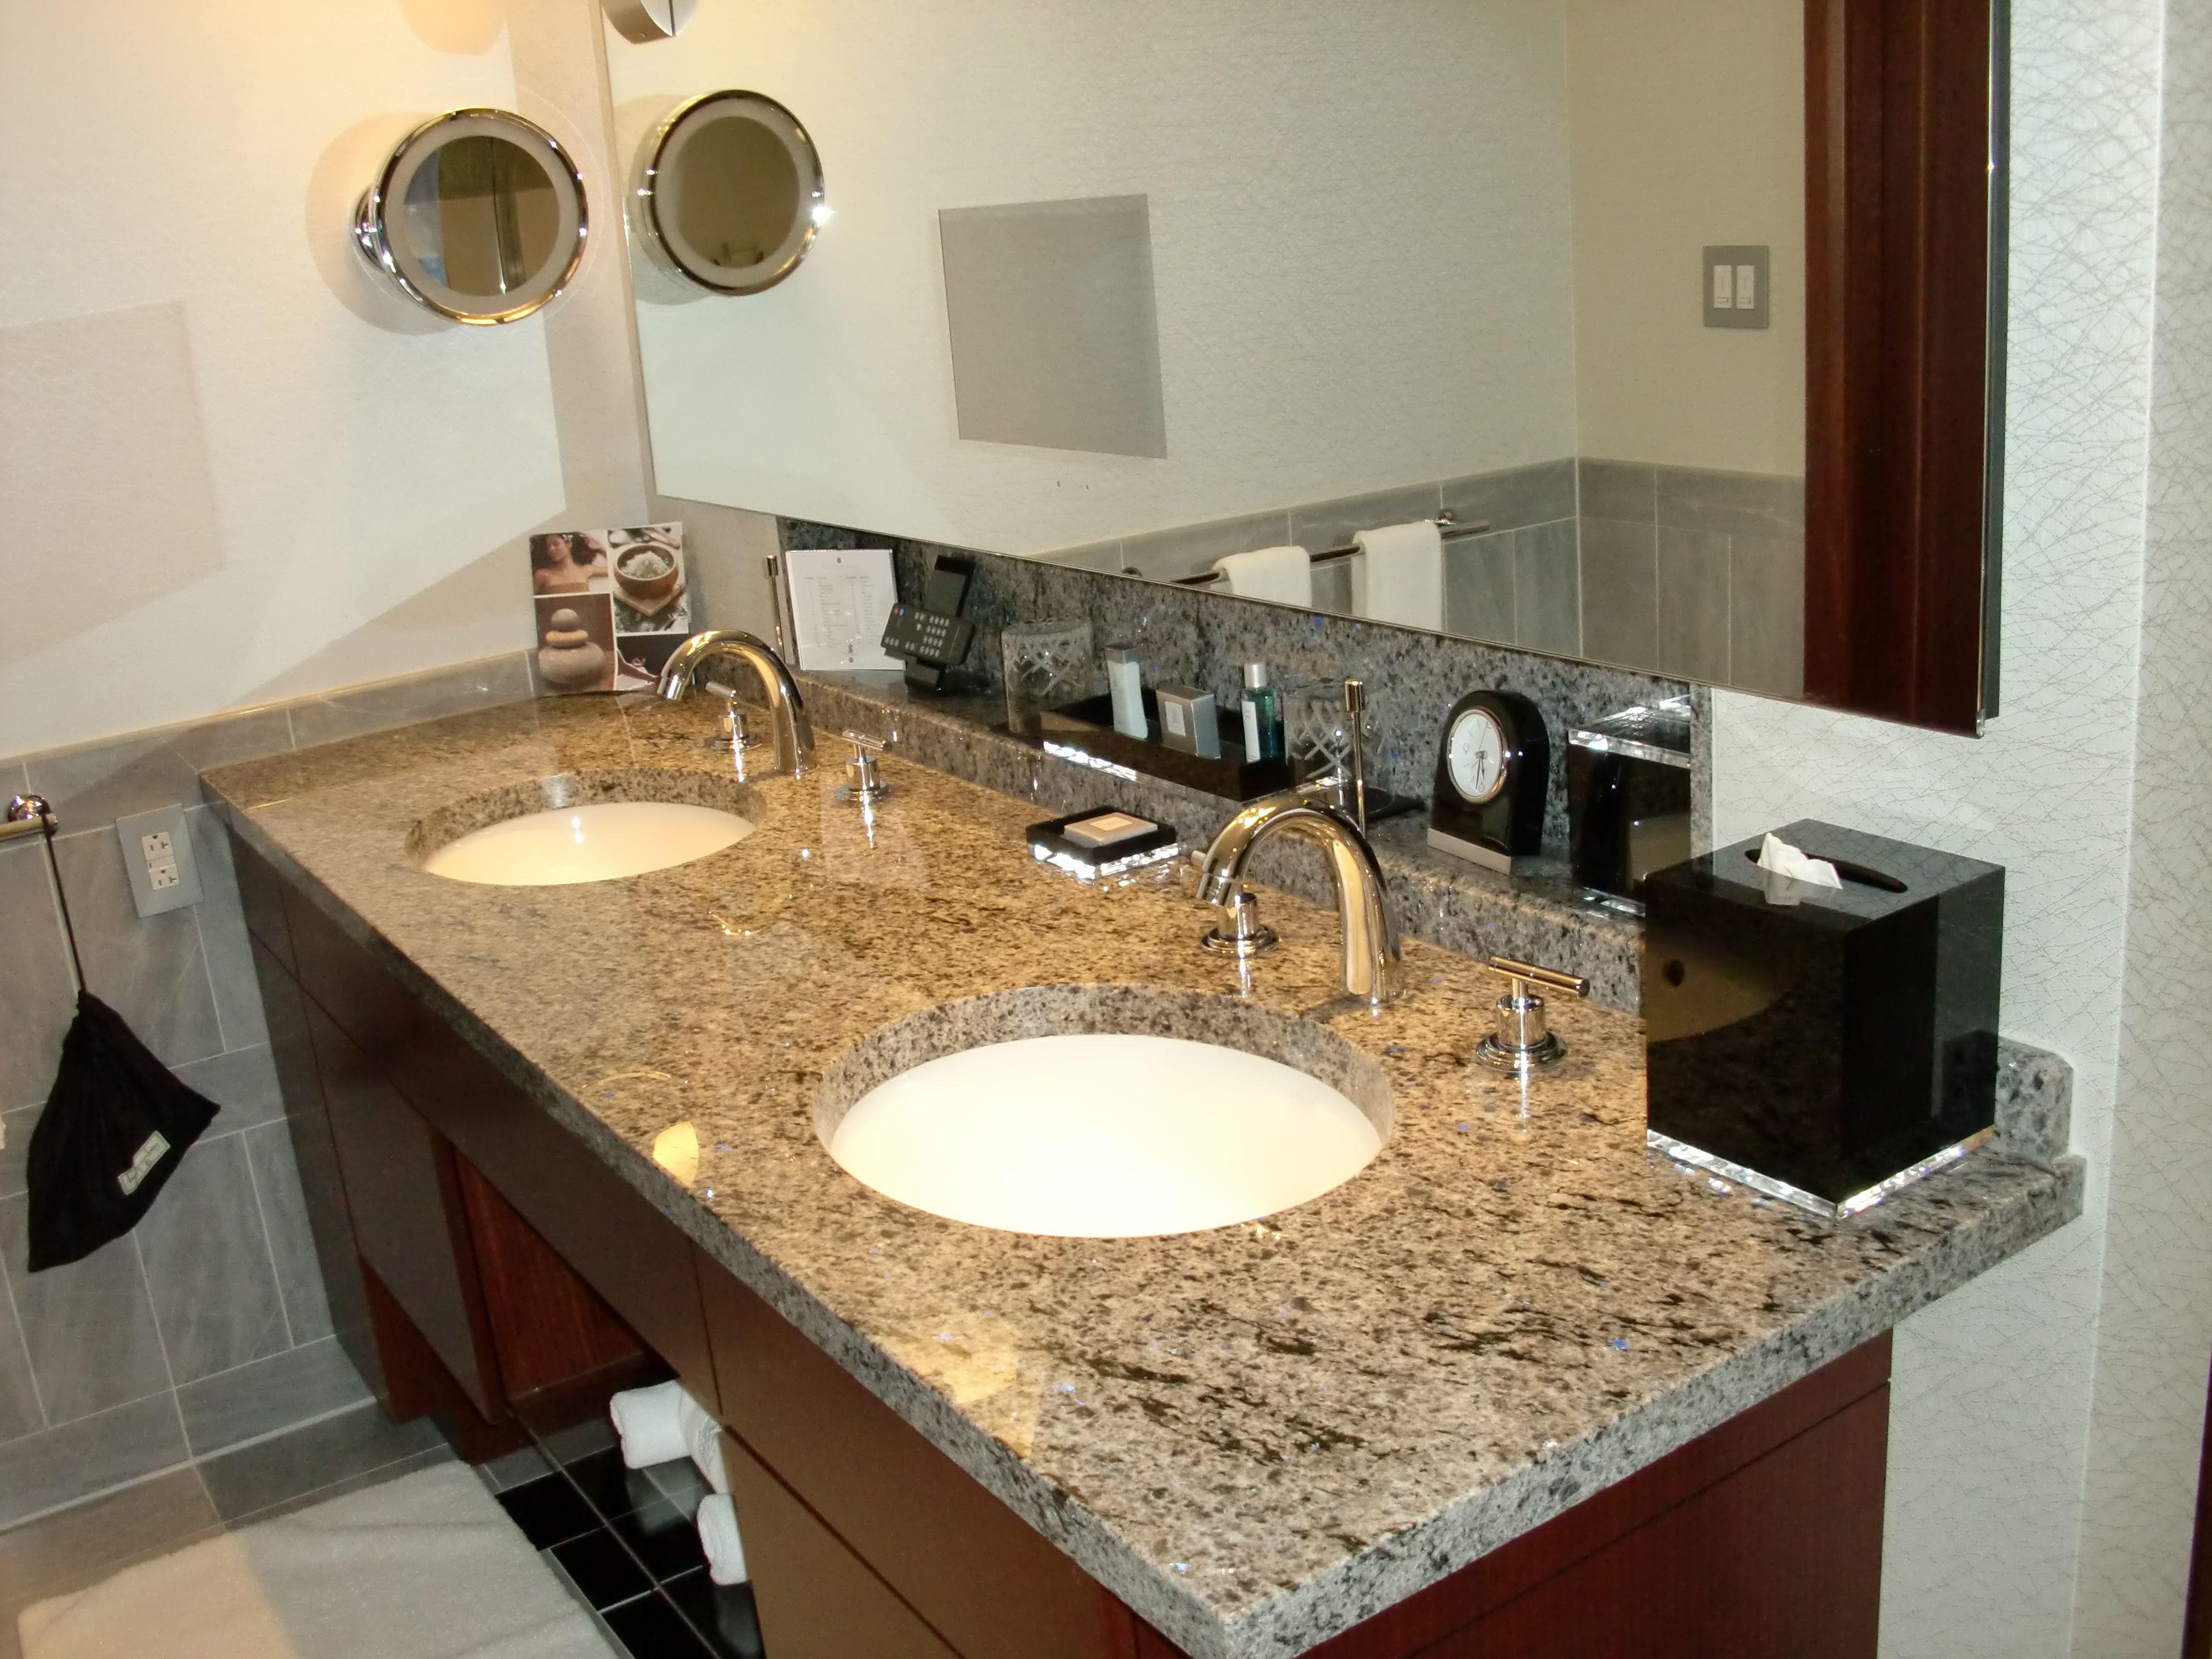 Bathroom Sinks Charlotte Nc ritz-carlton, charlotte, nc | noplasticshowers